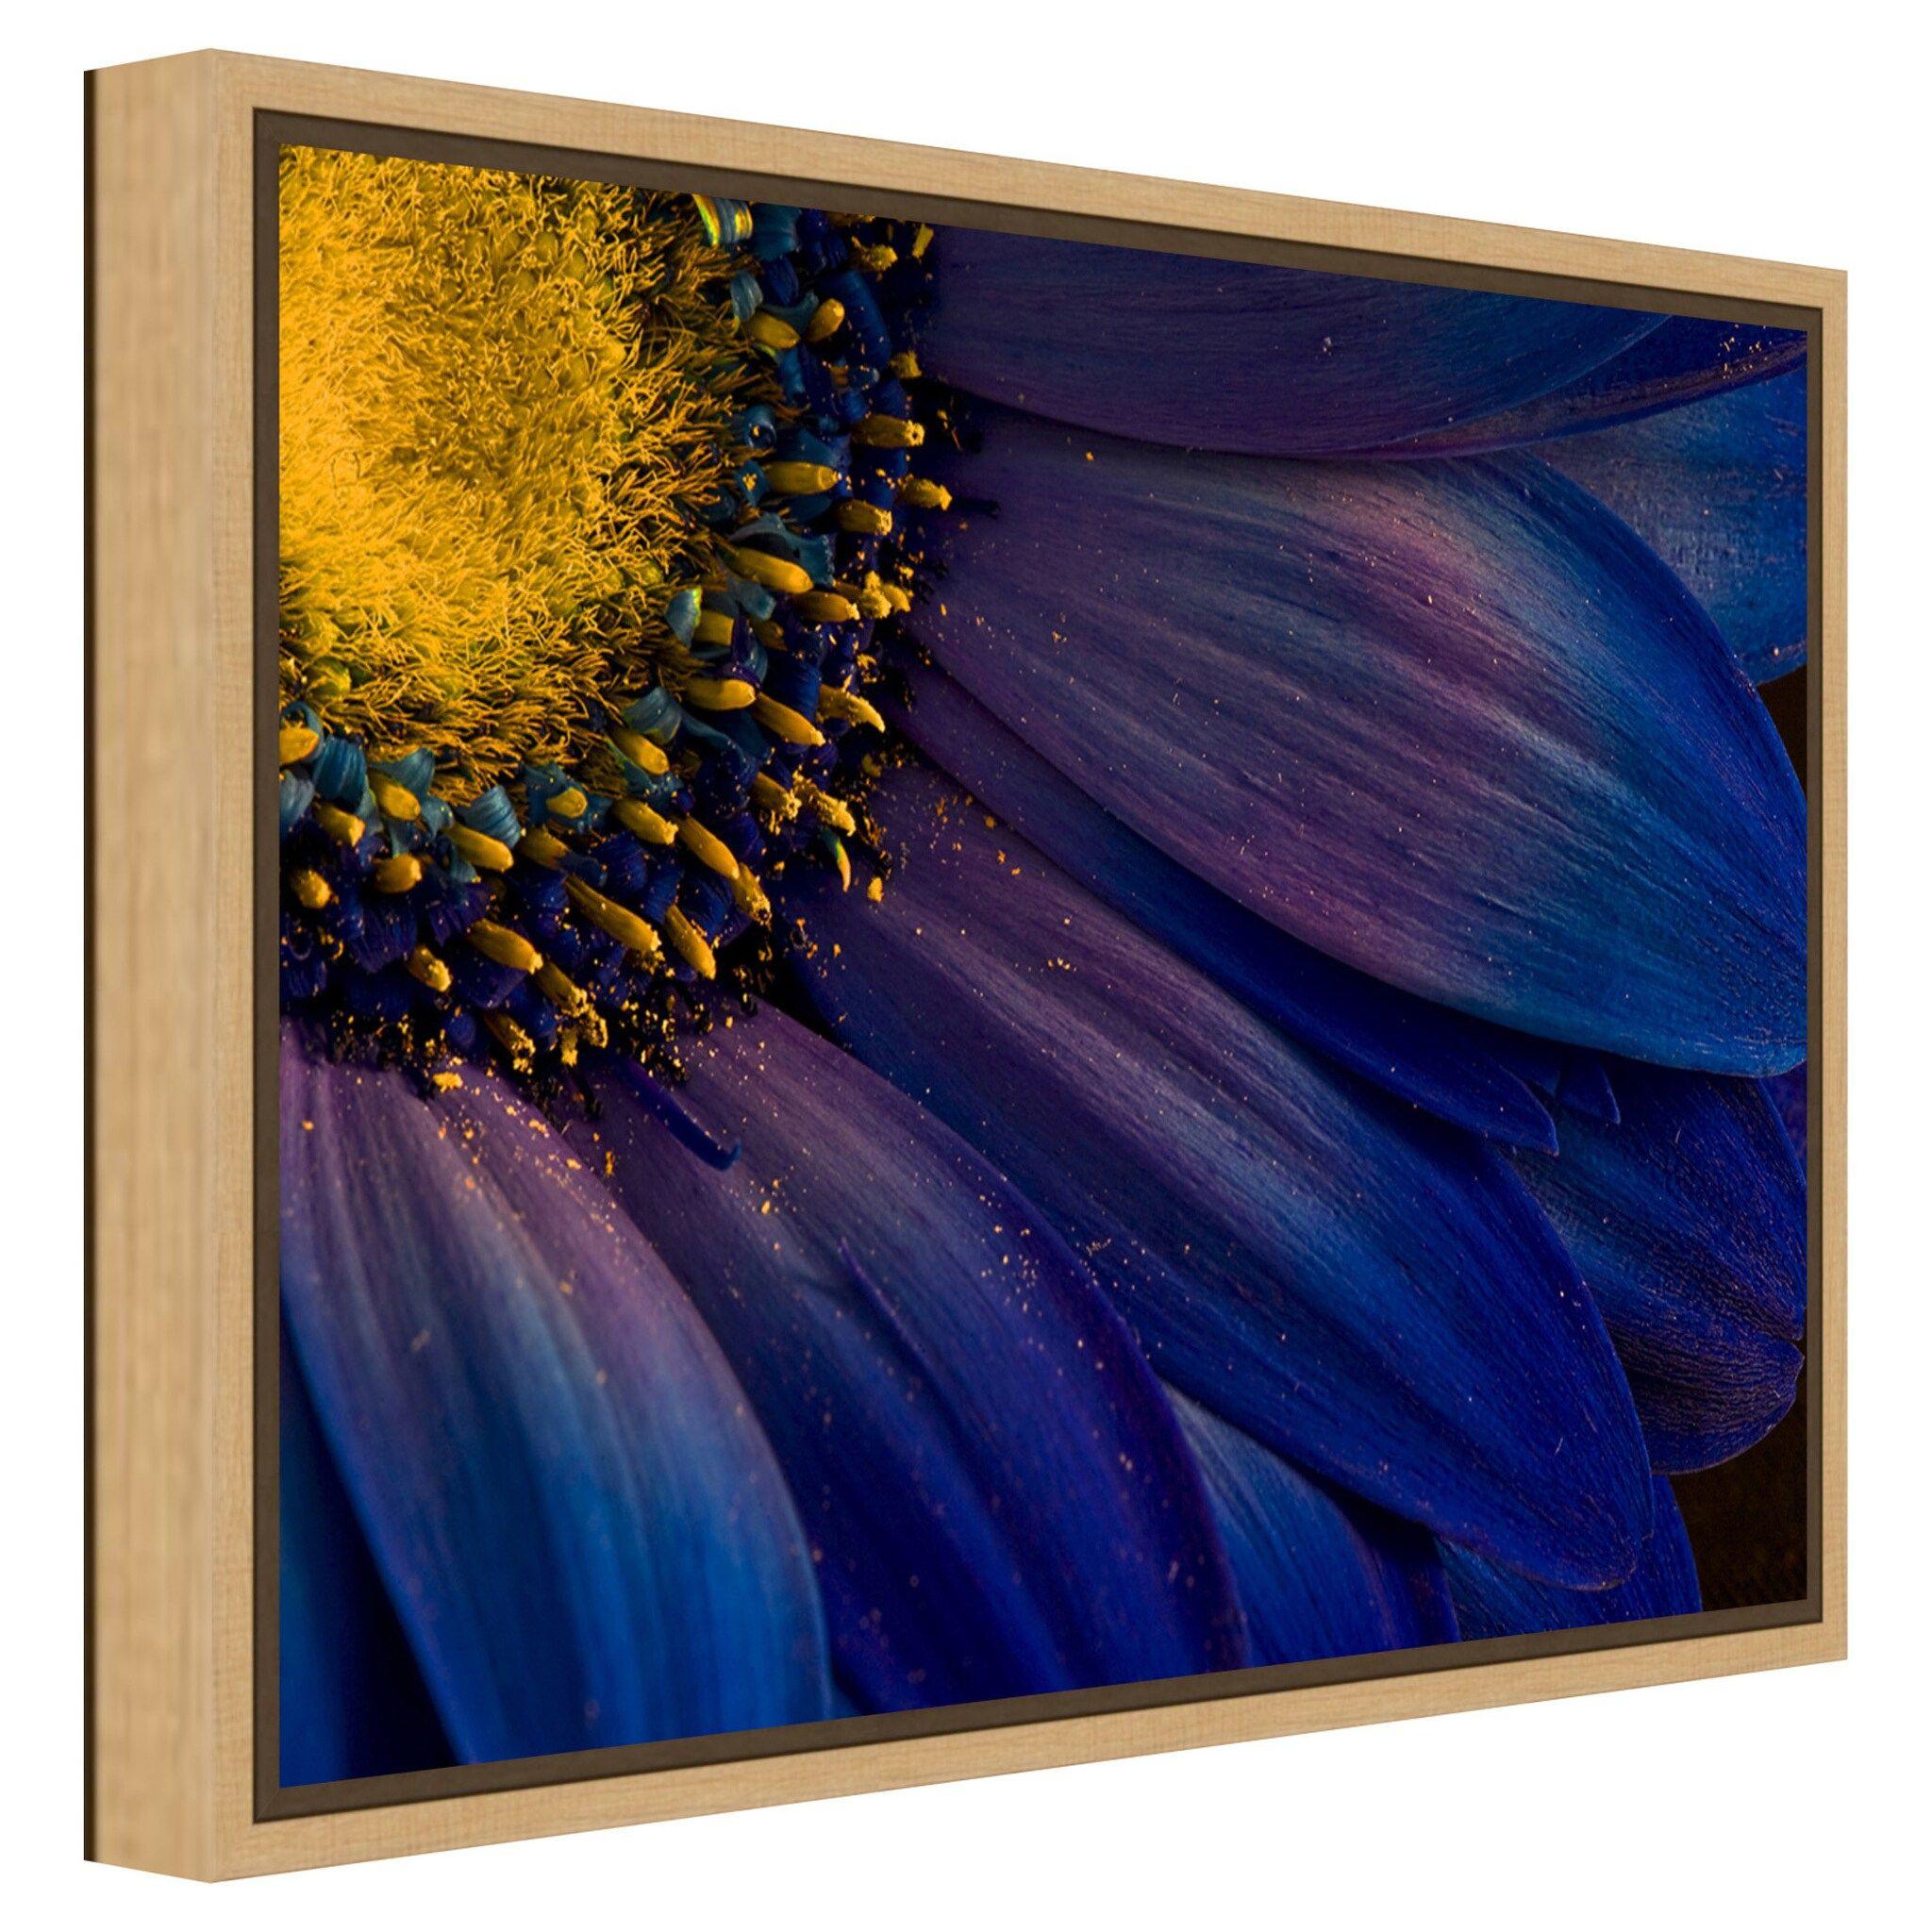 Amanti Art Blue Rays Wall Art Affiliate Art Amanti Blue Wall Em 2020 Pintura Em Tela Flores Pintura Em Tela Pintura Em Tecido